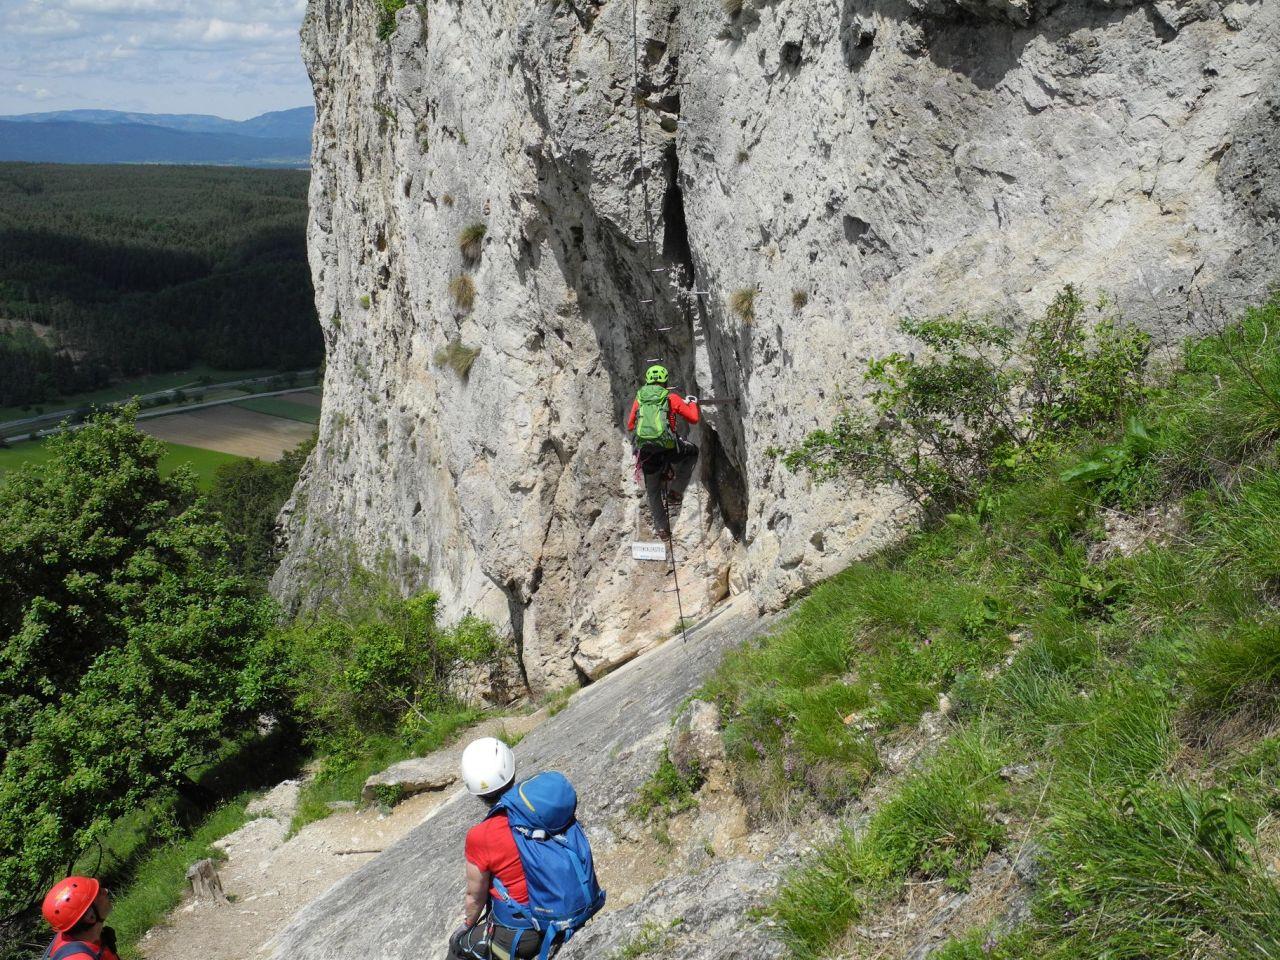 Pittentaler Klettersteig : Pittentaler klettersteig petra b fritz flickr